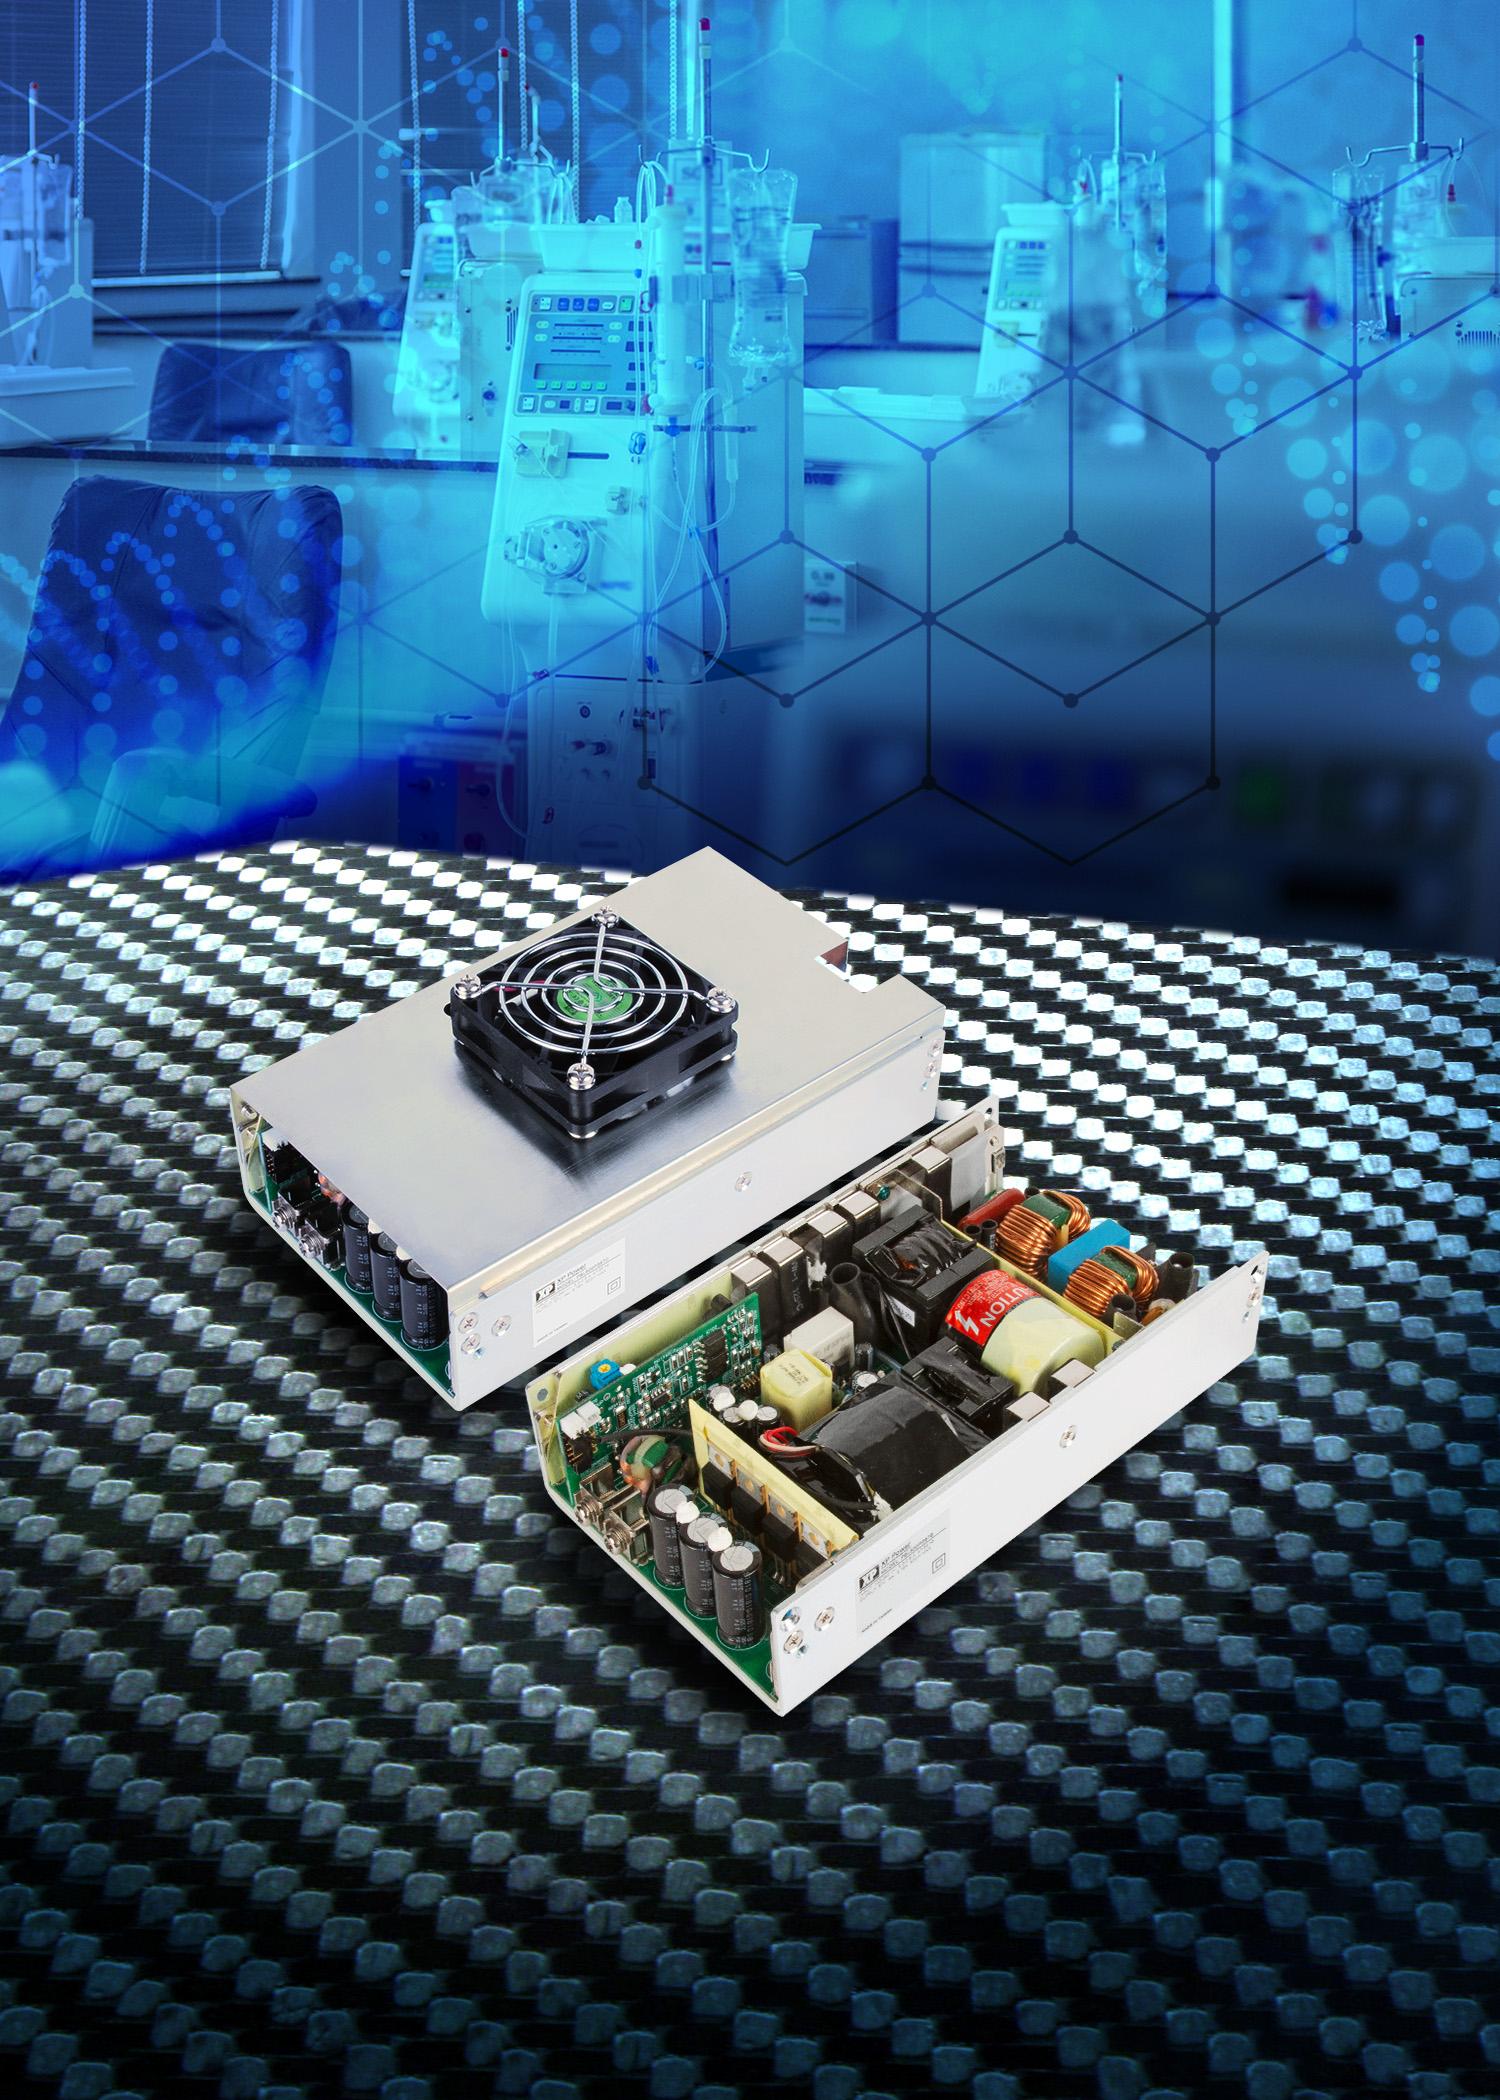 XP Power推出新款500W符合class II应用的电源,适用于医疗设备,包括BF应用